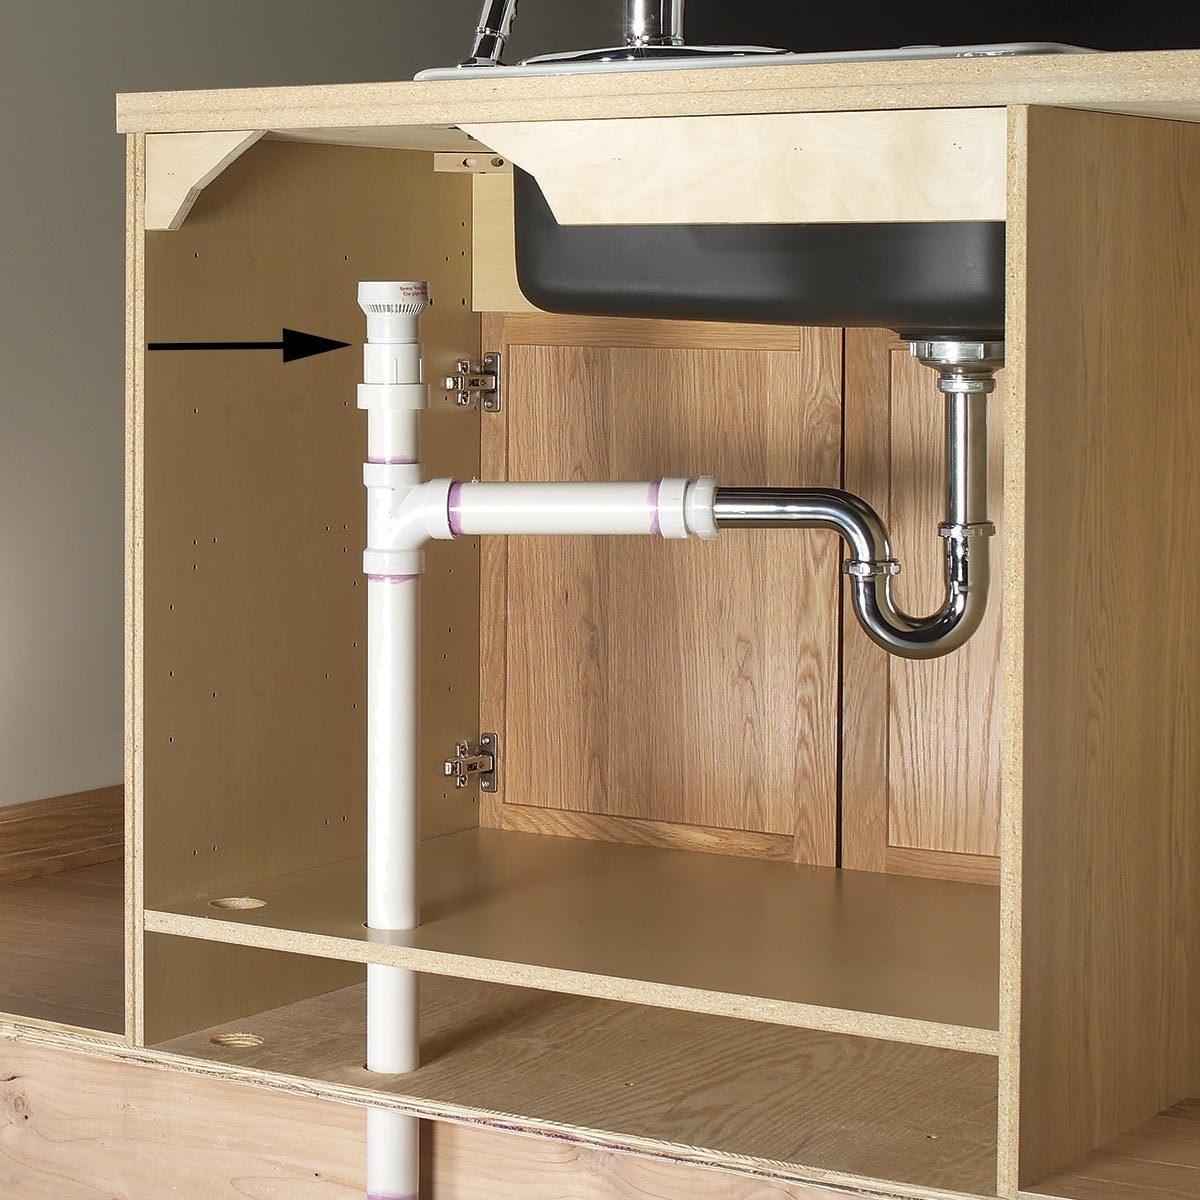 plumbing cutaway under sink